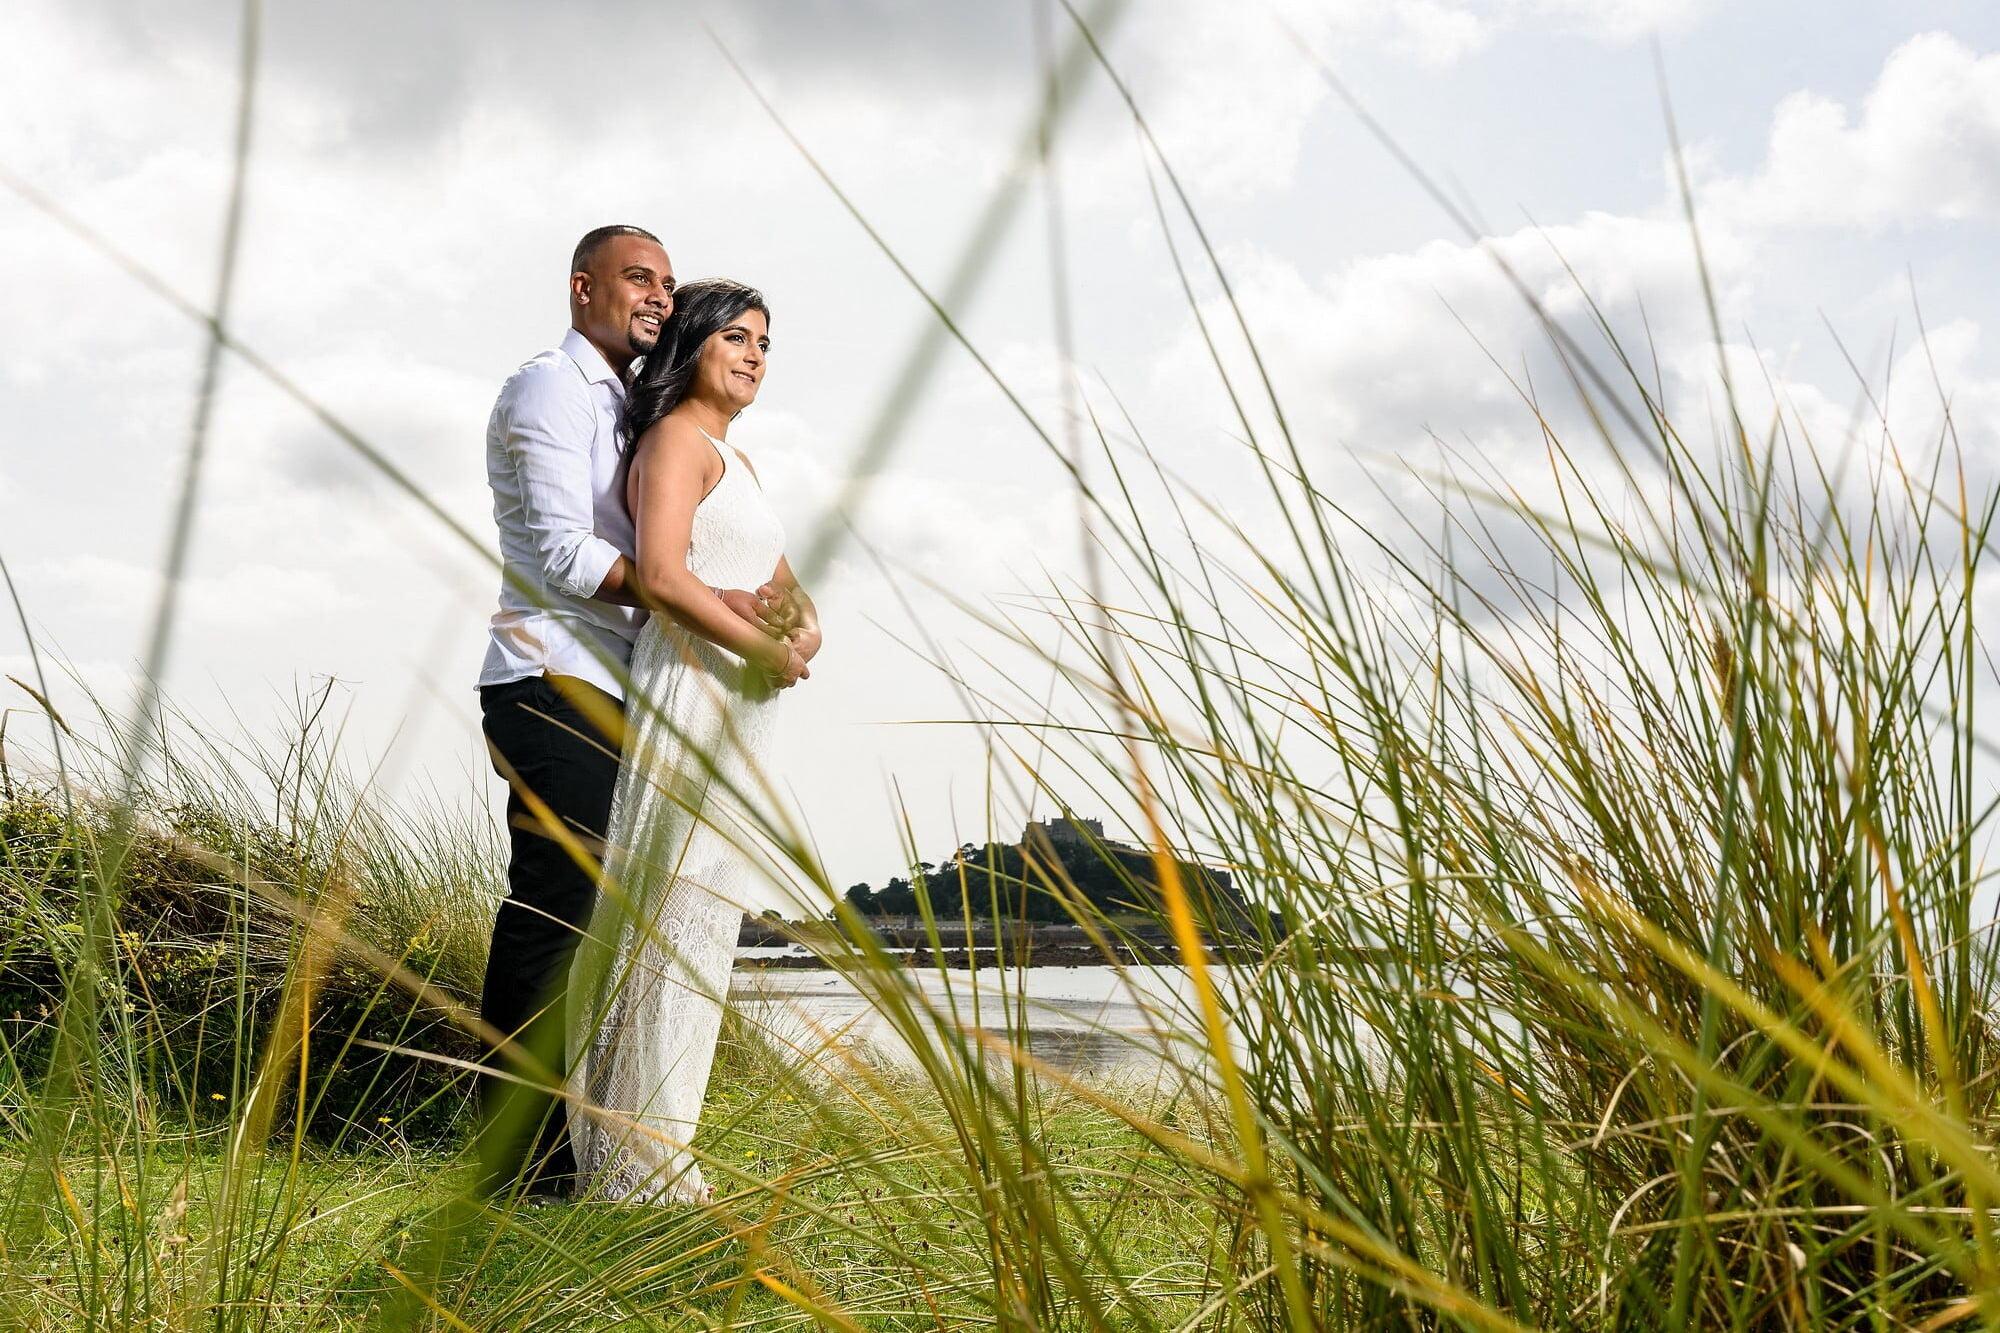 st-michaels-mount-wedding-proposal-8